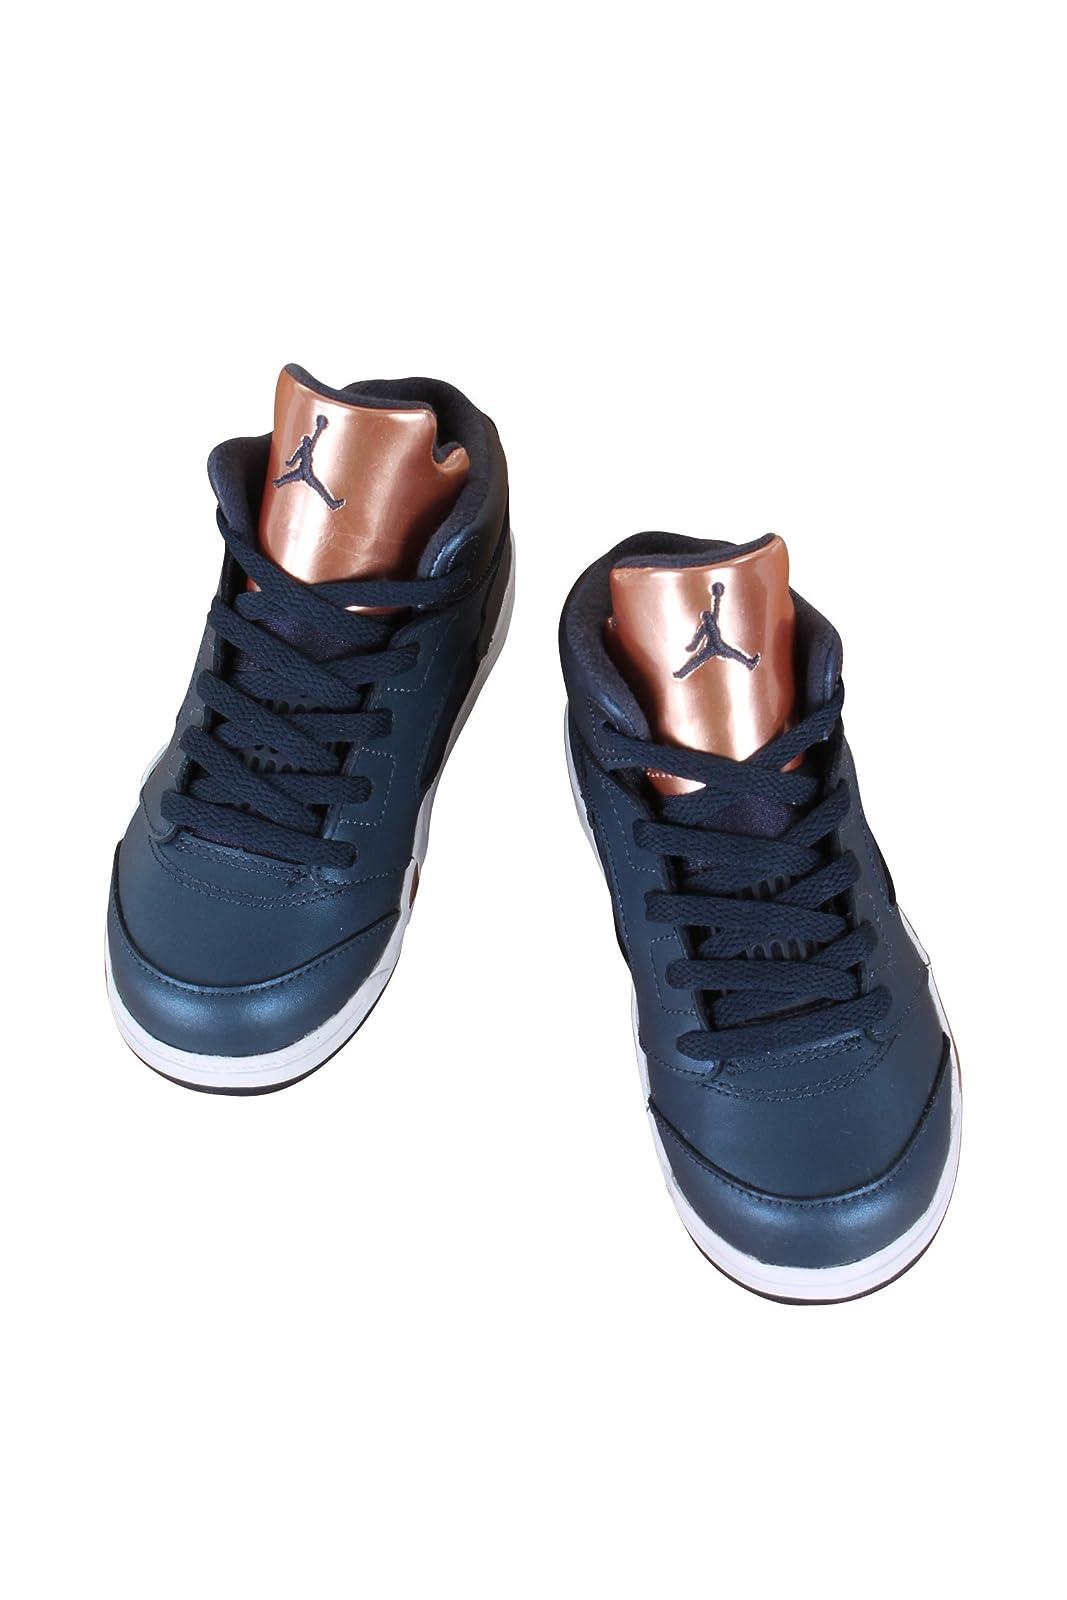 Jordan 5 Retro Bt Toddlers Obsidian/Bronze - 2